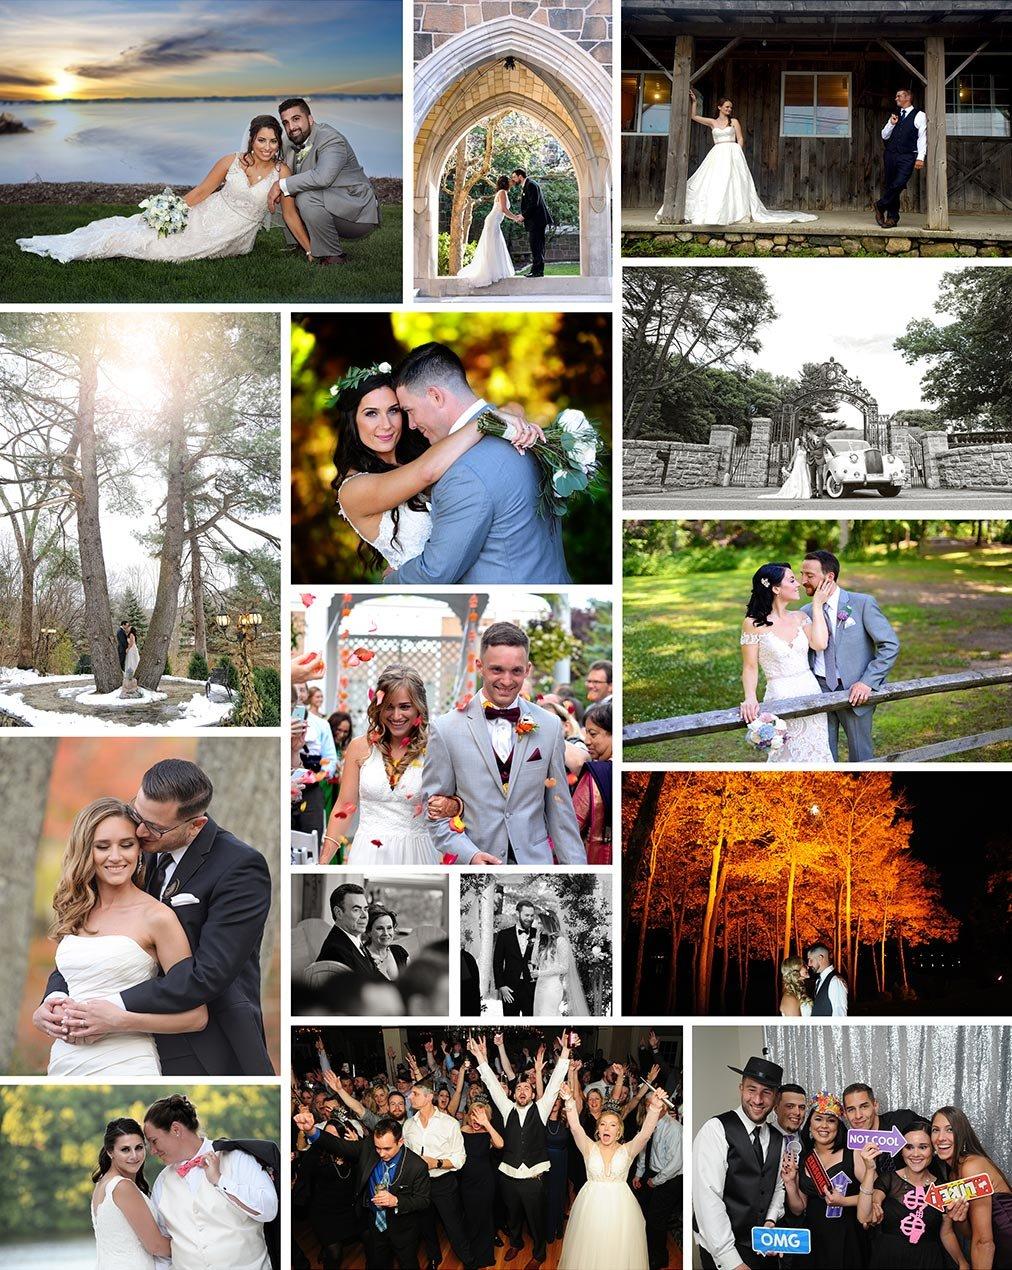 wedding gallery image 4